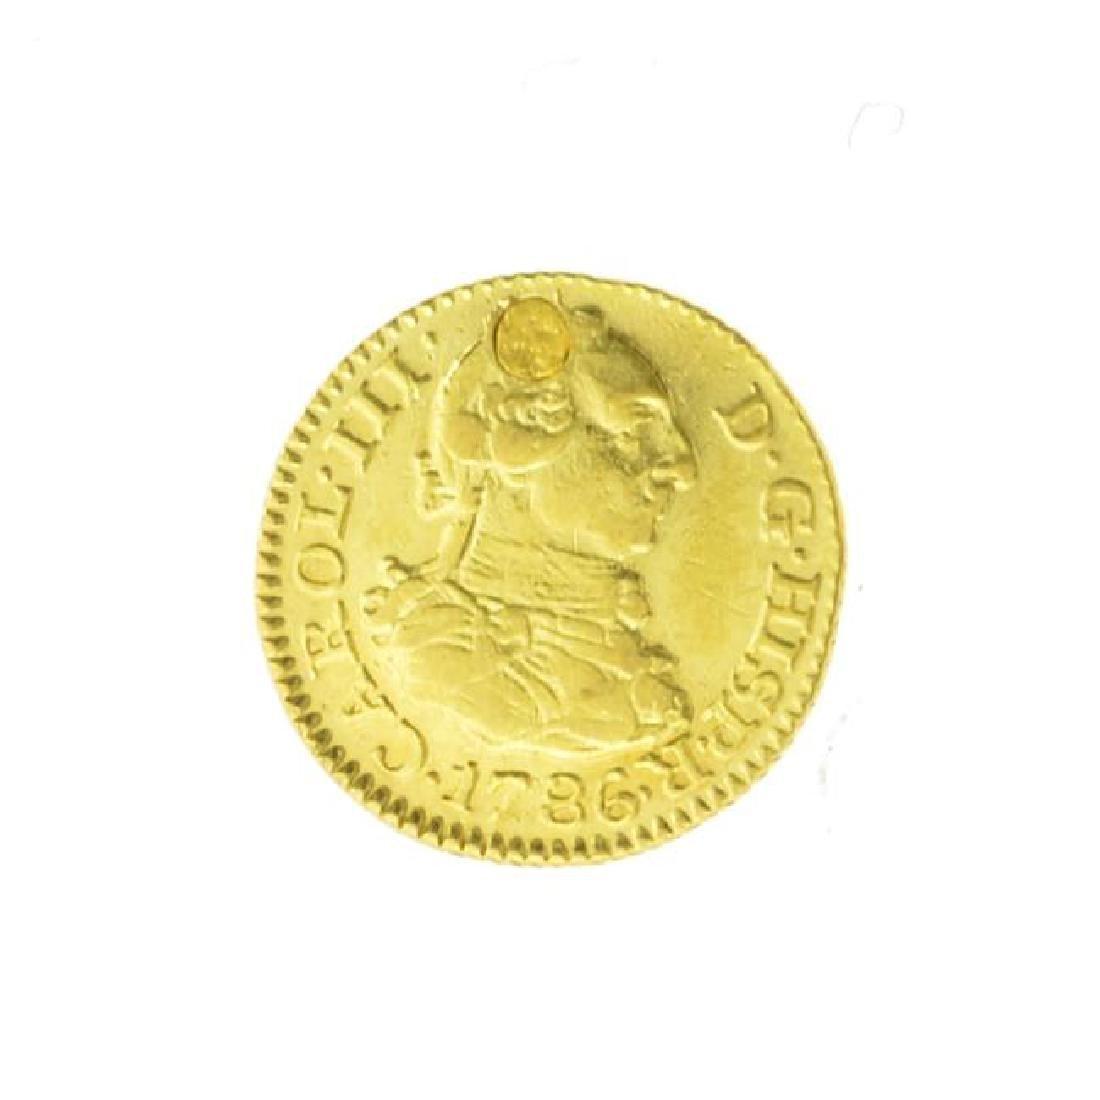 1786 Spain Half Escudo Carlos III Gold Coin (JG)